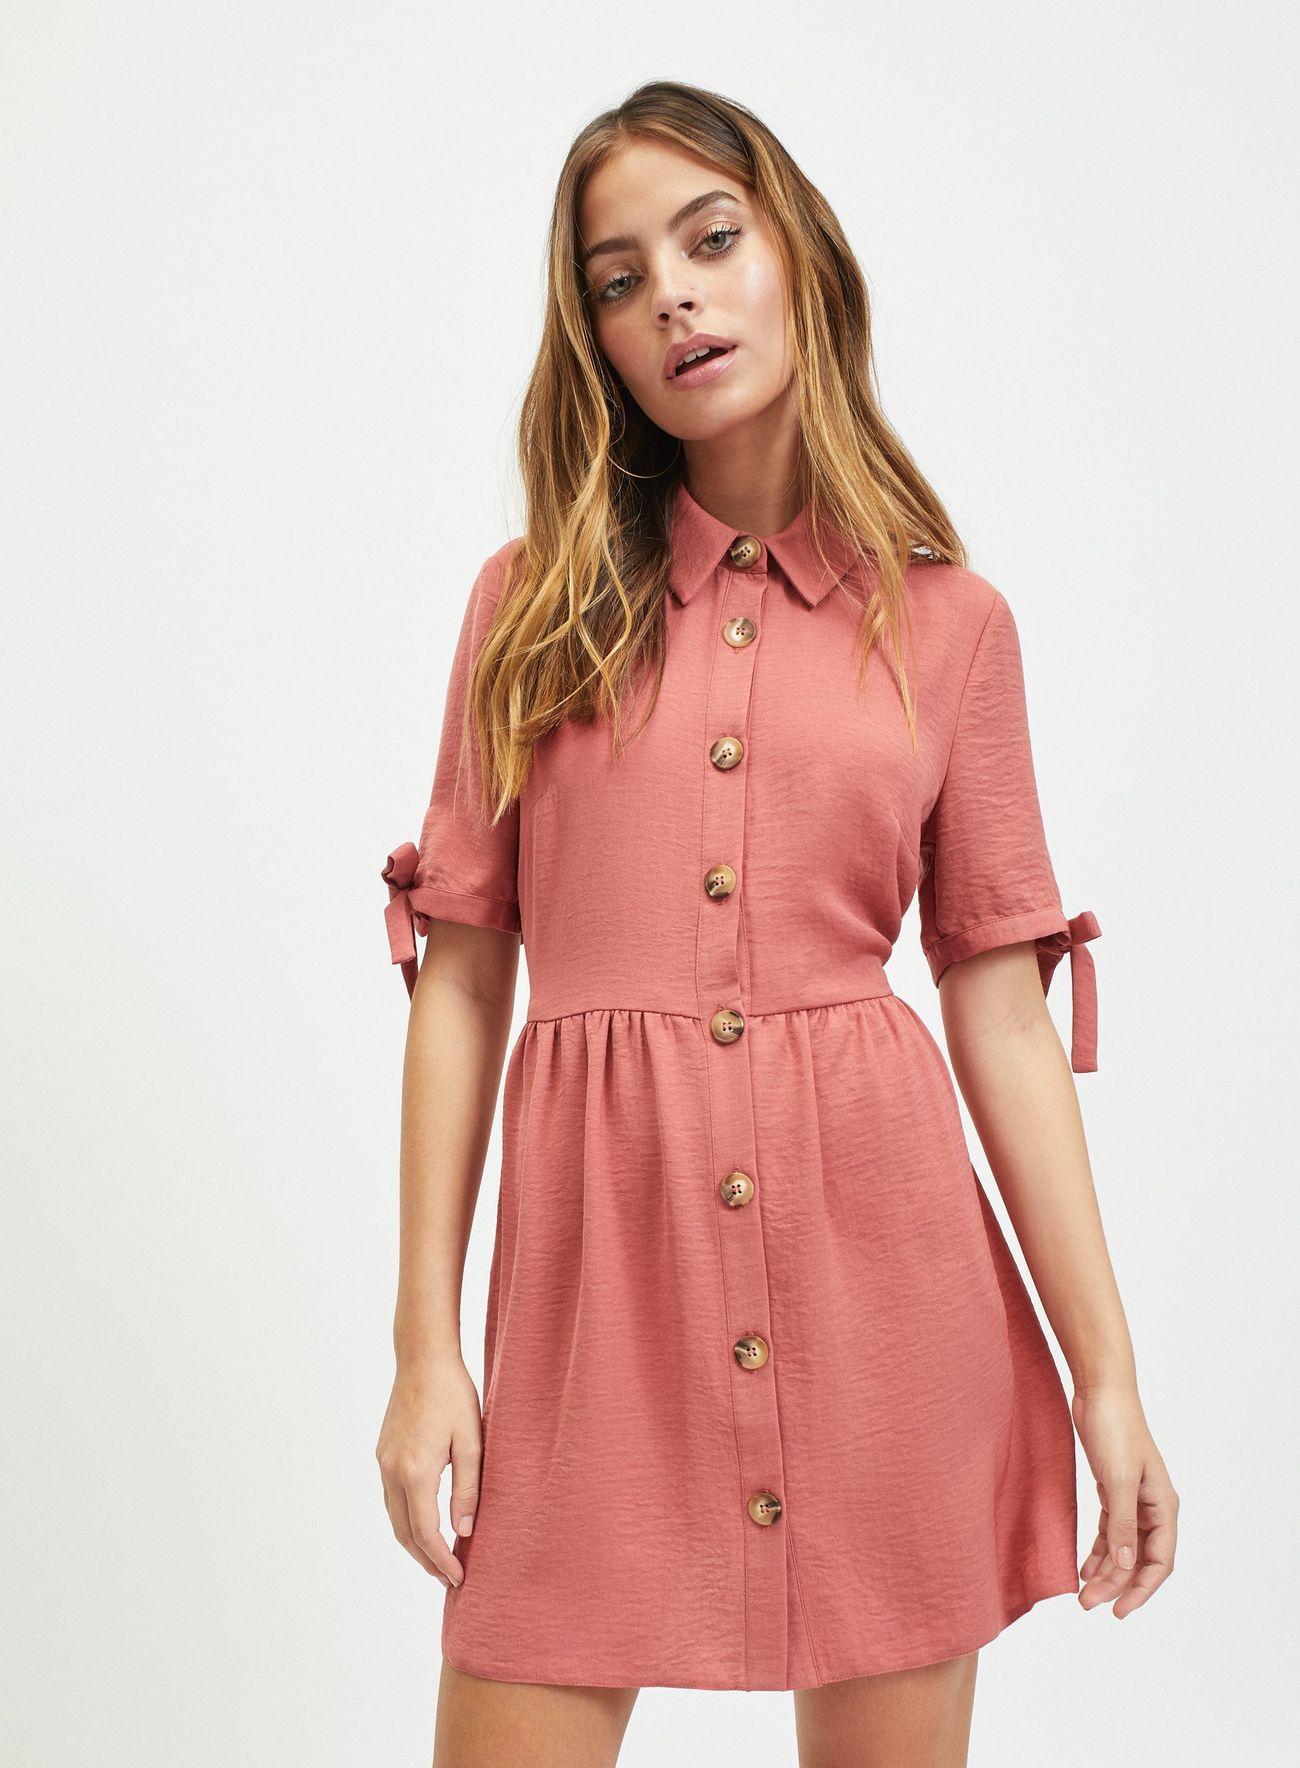 e0efb70c41810 PETITE Pink Shirt Dress in 2019 | Fashion | Shirt dress, Dresses ...